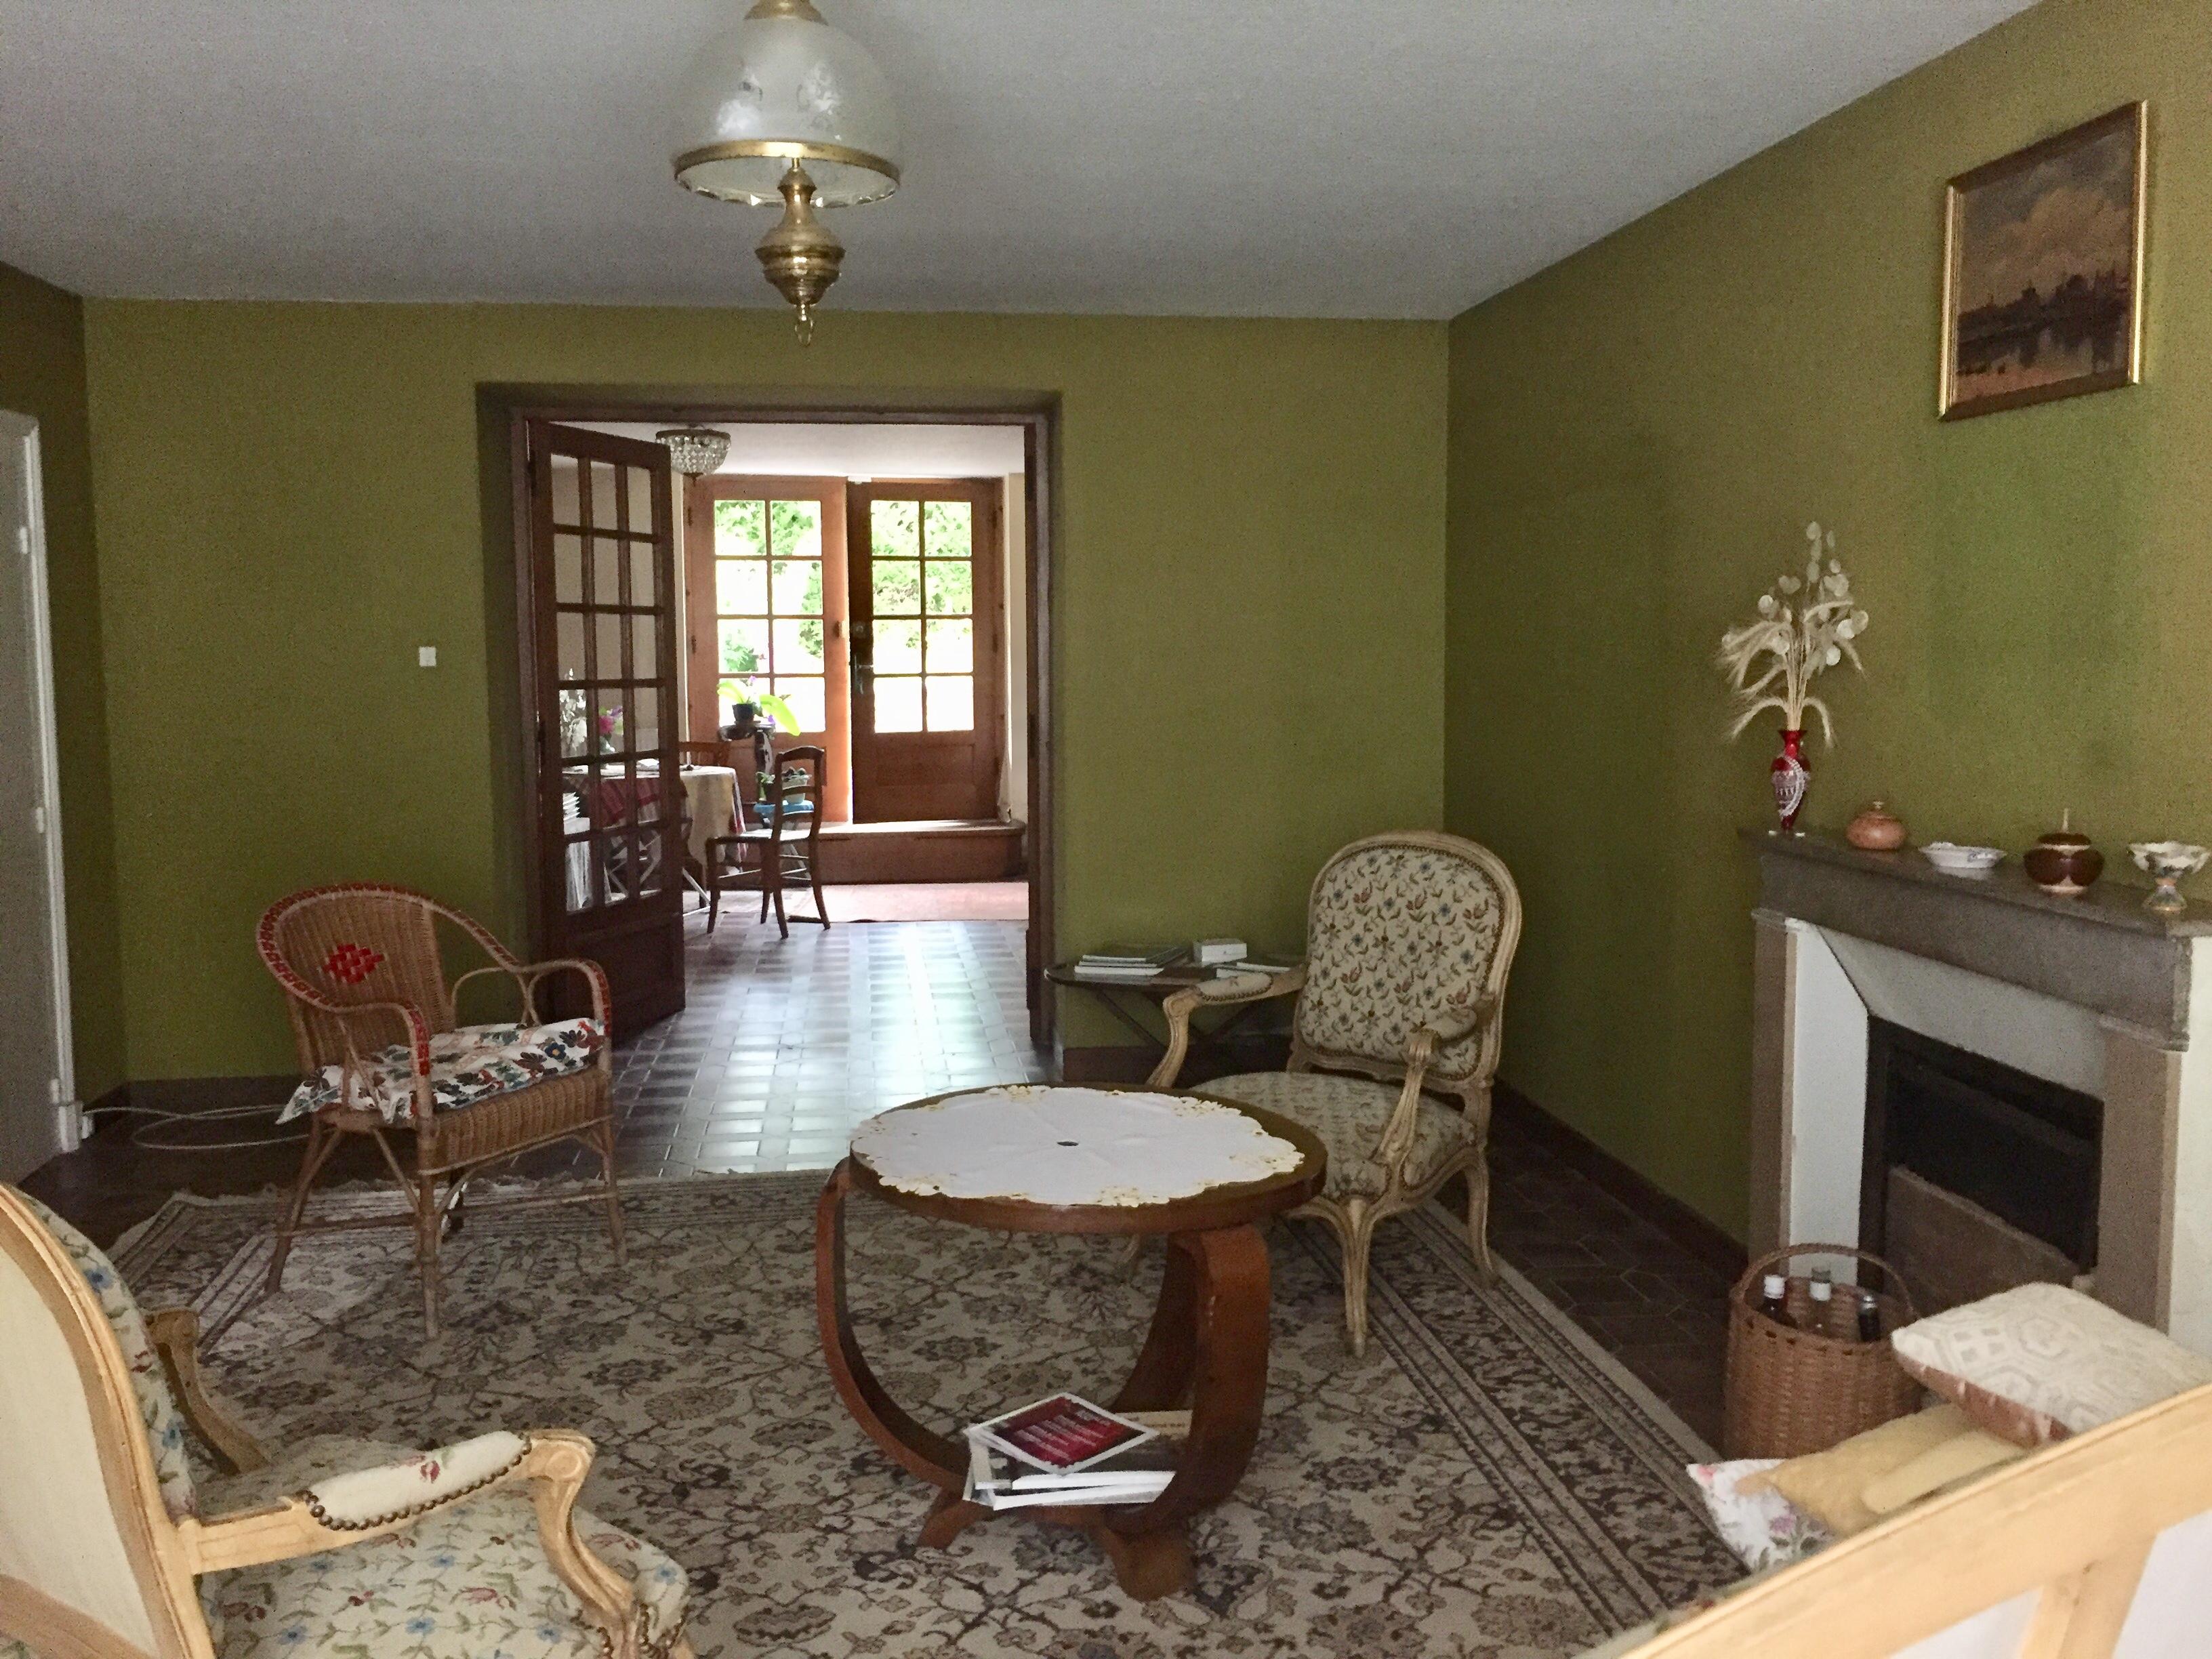 appel d 39 offre particulier annonce 388. Black Bedroom Furniture Sets. Home Design Ideas